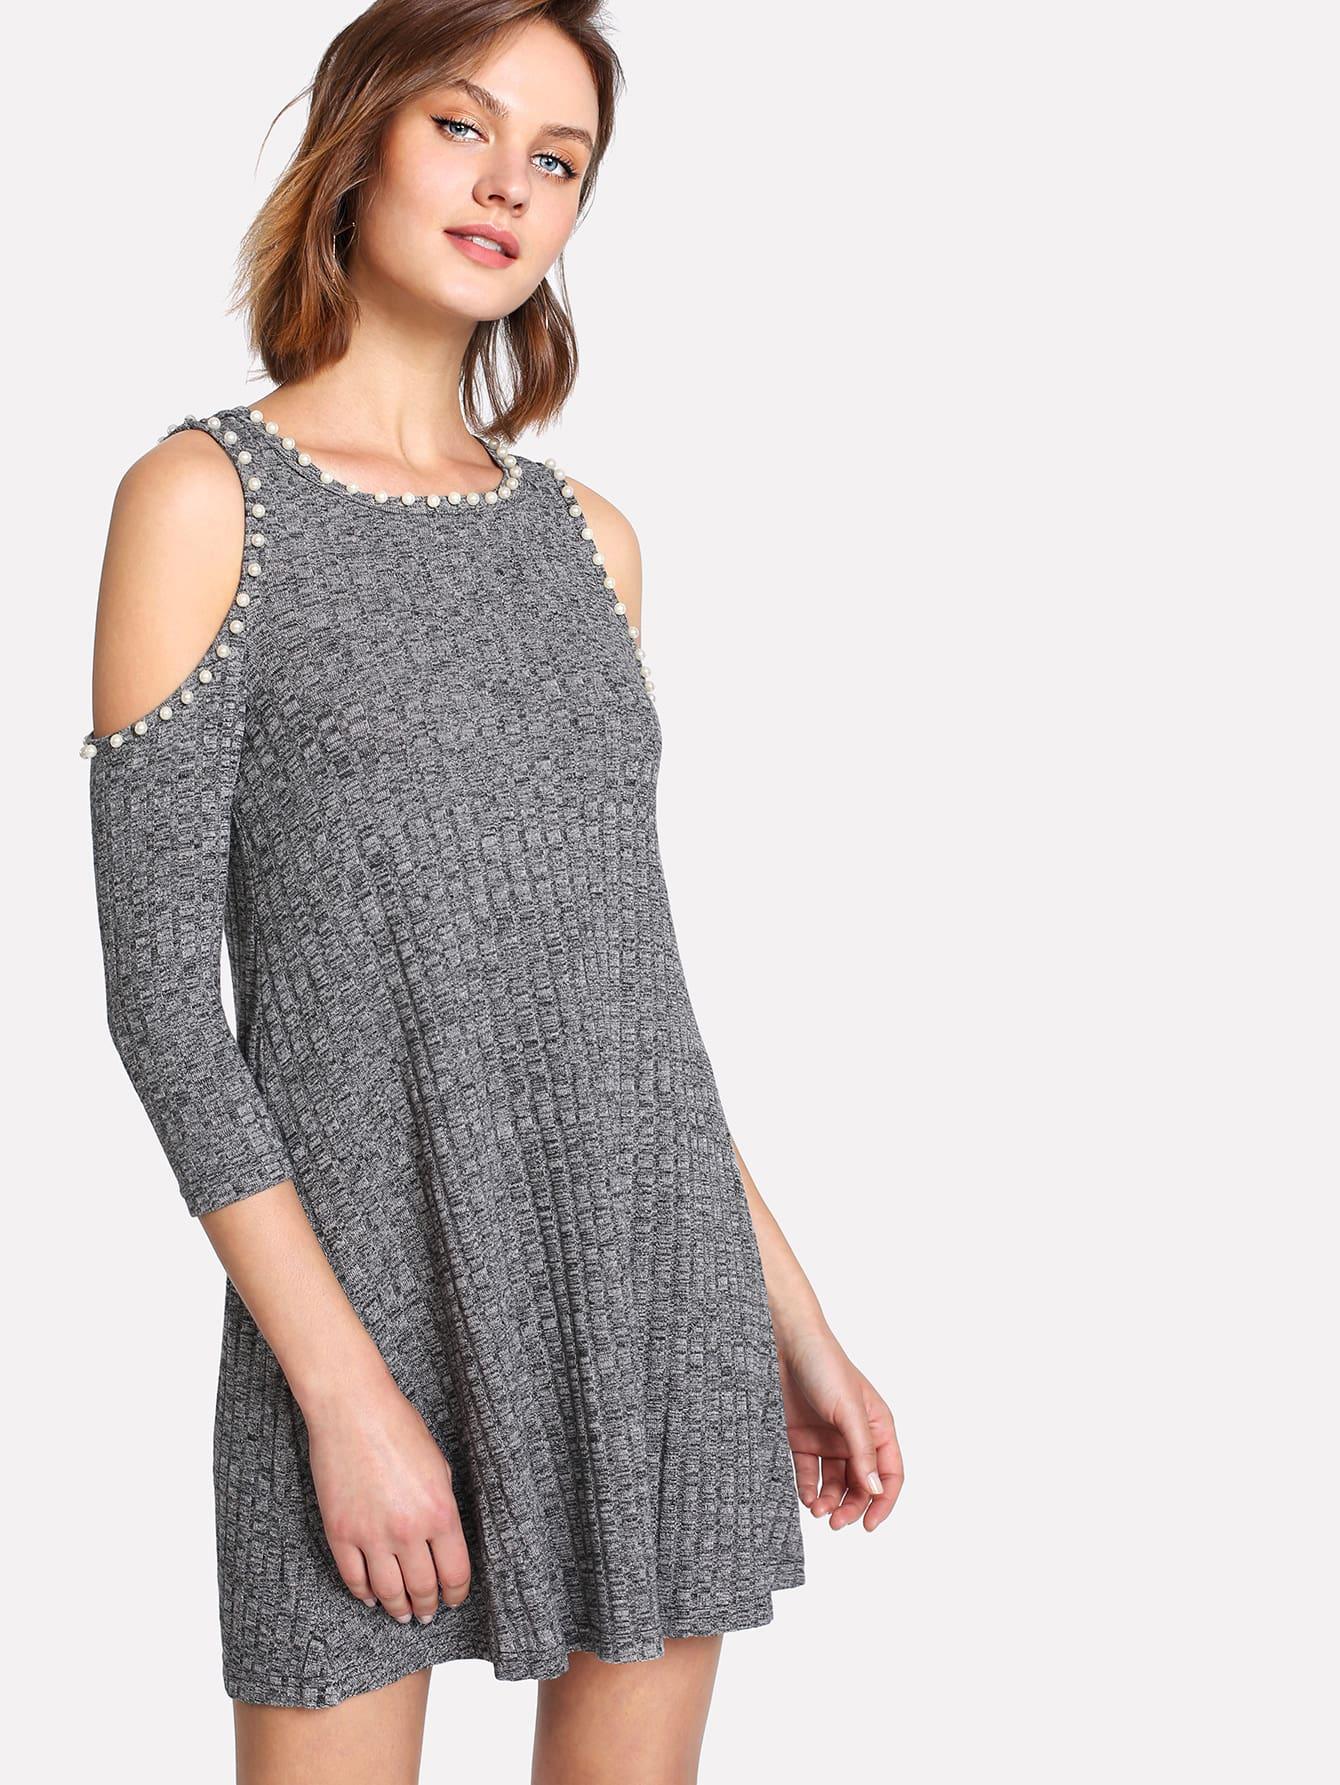 Pearl Beaded Trim Open Shoulder Dress джеймс эшер bhakta ranga rasa india новый взгляд mp3